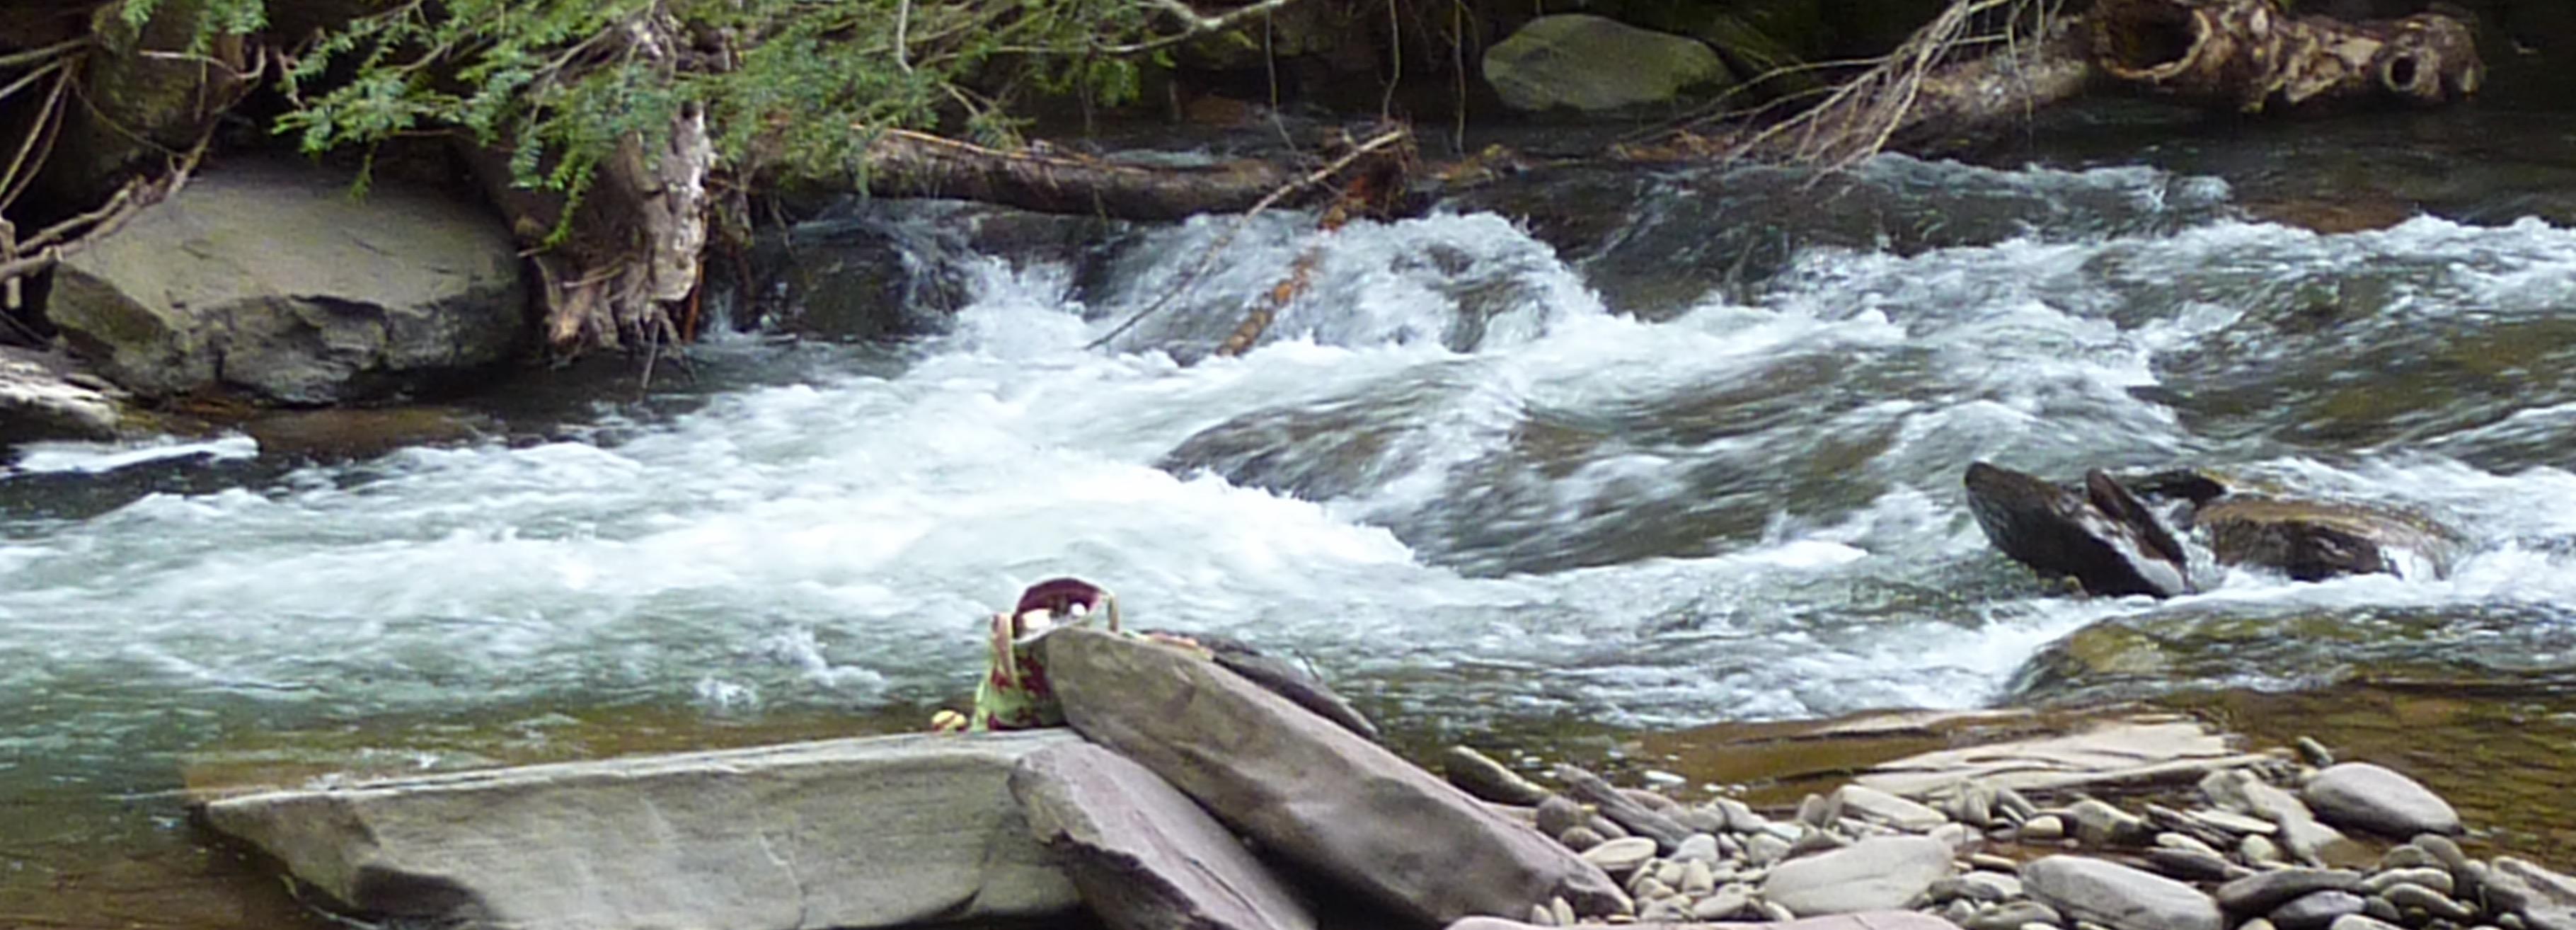 https://bluedeer.center/events/2020-08/summer-healing-retreat-in-nature